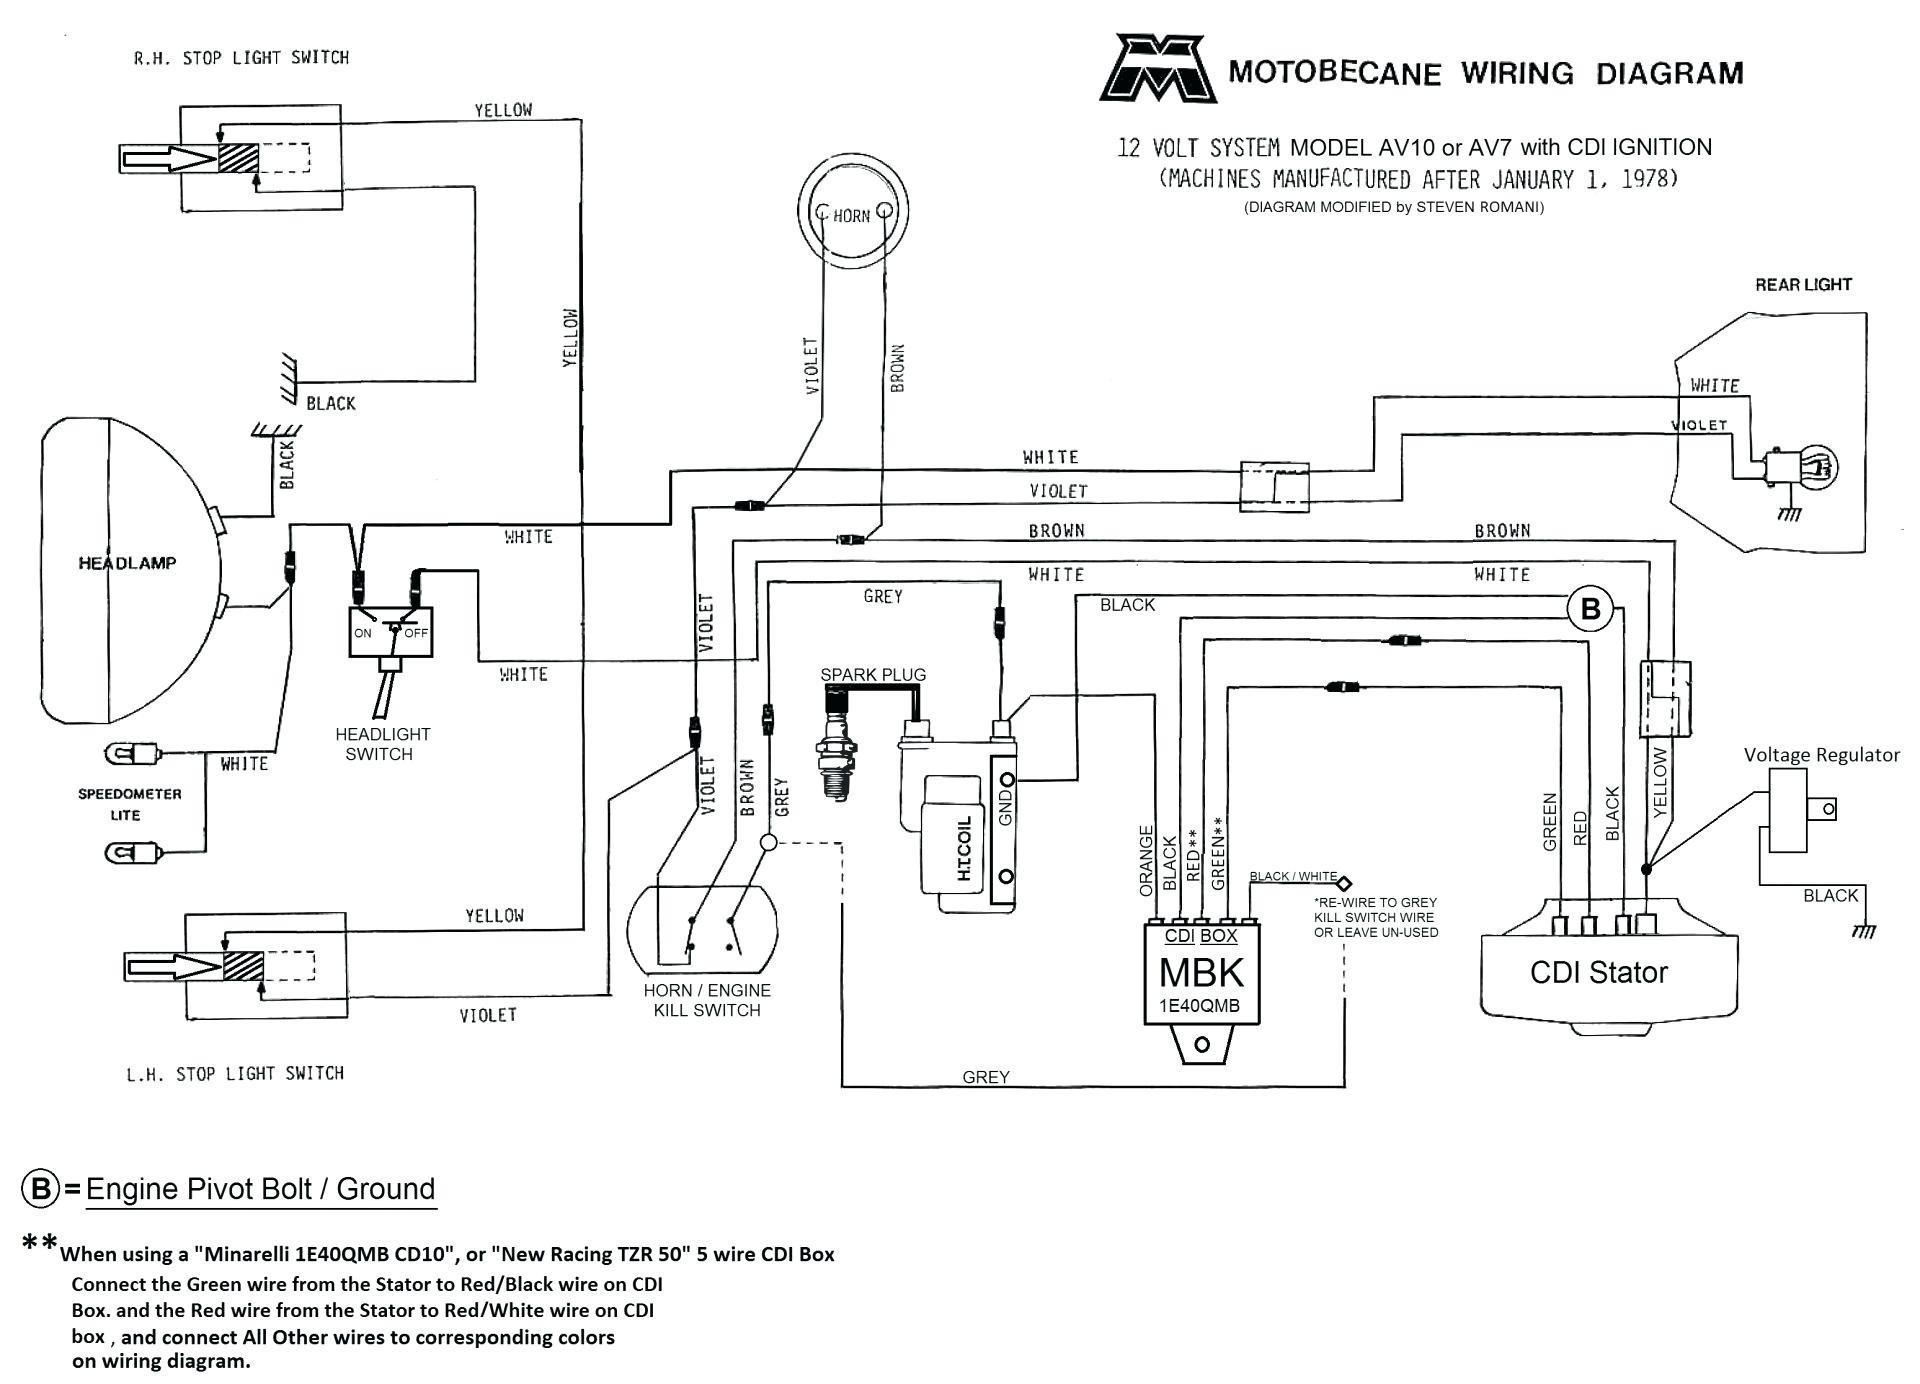 2006 ezgo txt pds wiring diagram valid ez go freedom new gas golf